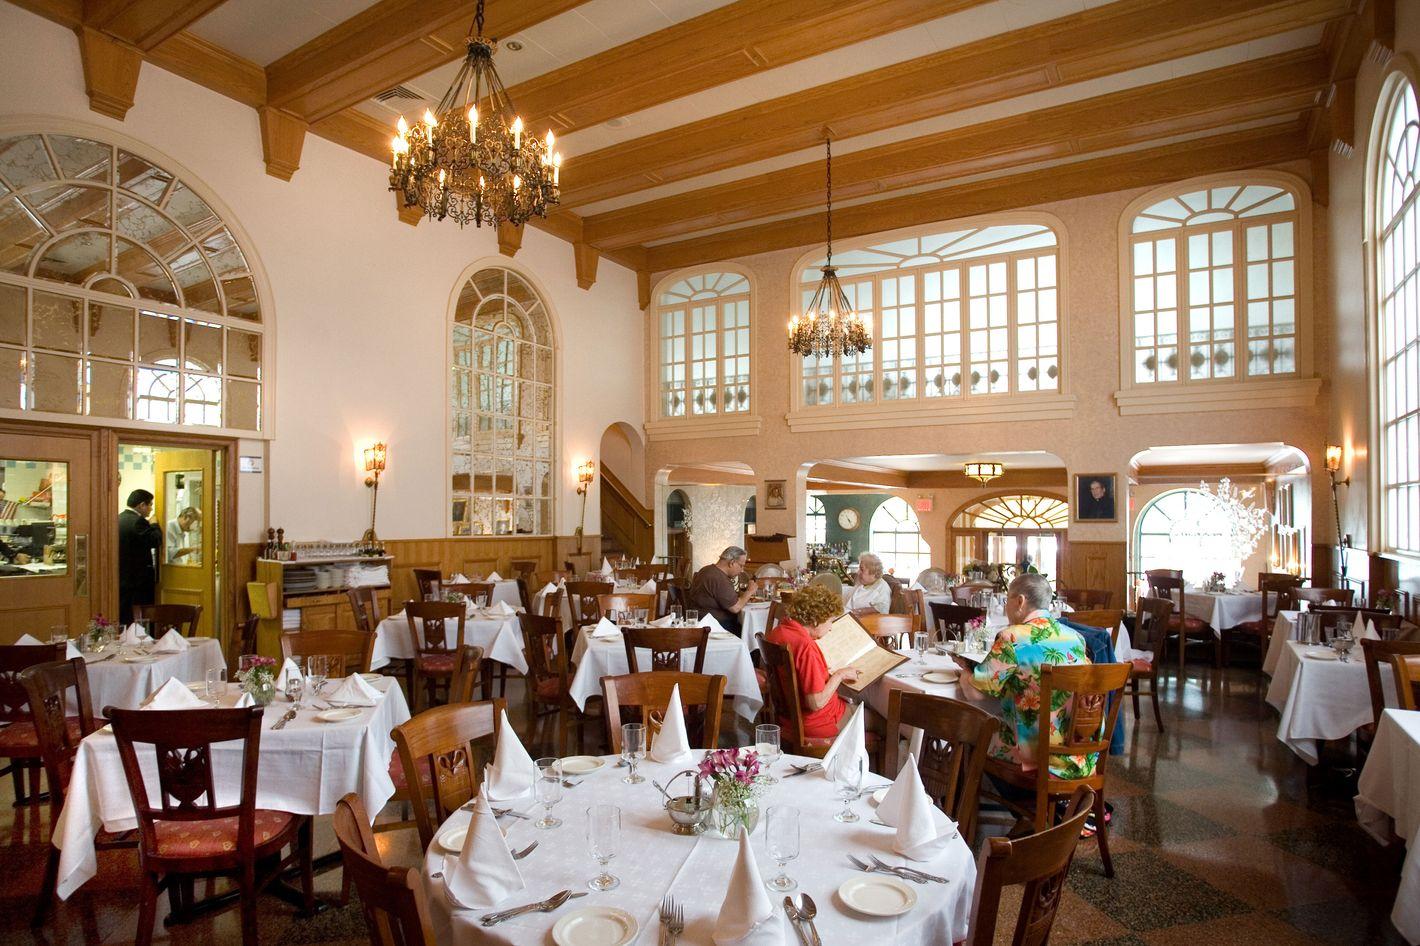 NYC Restaurant Cancels NRA Fundraiser After Backlash